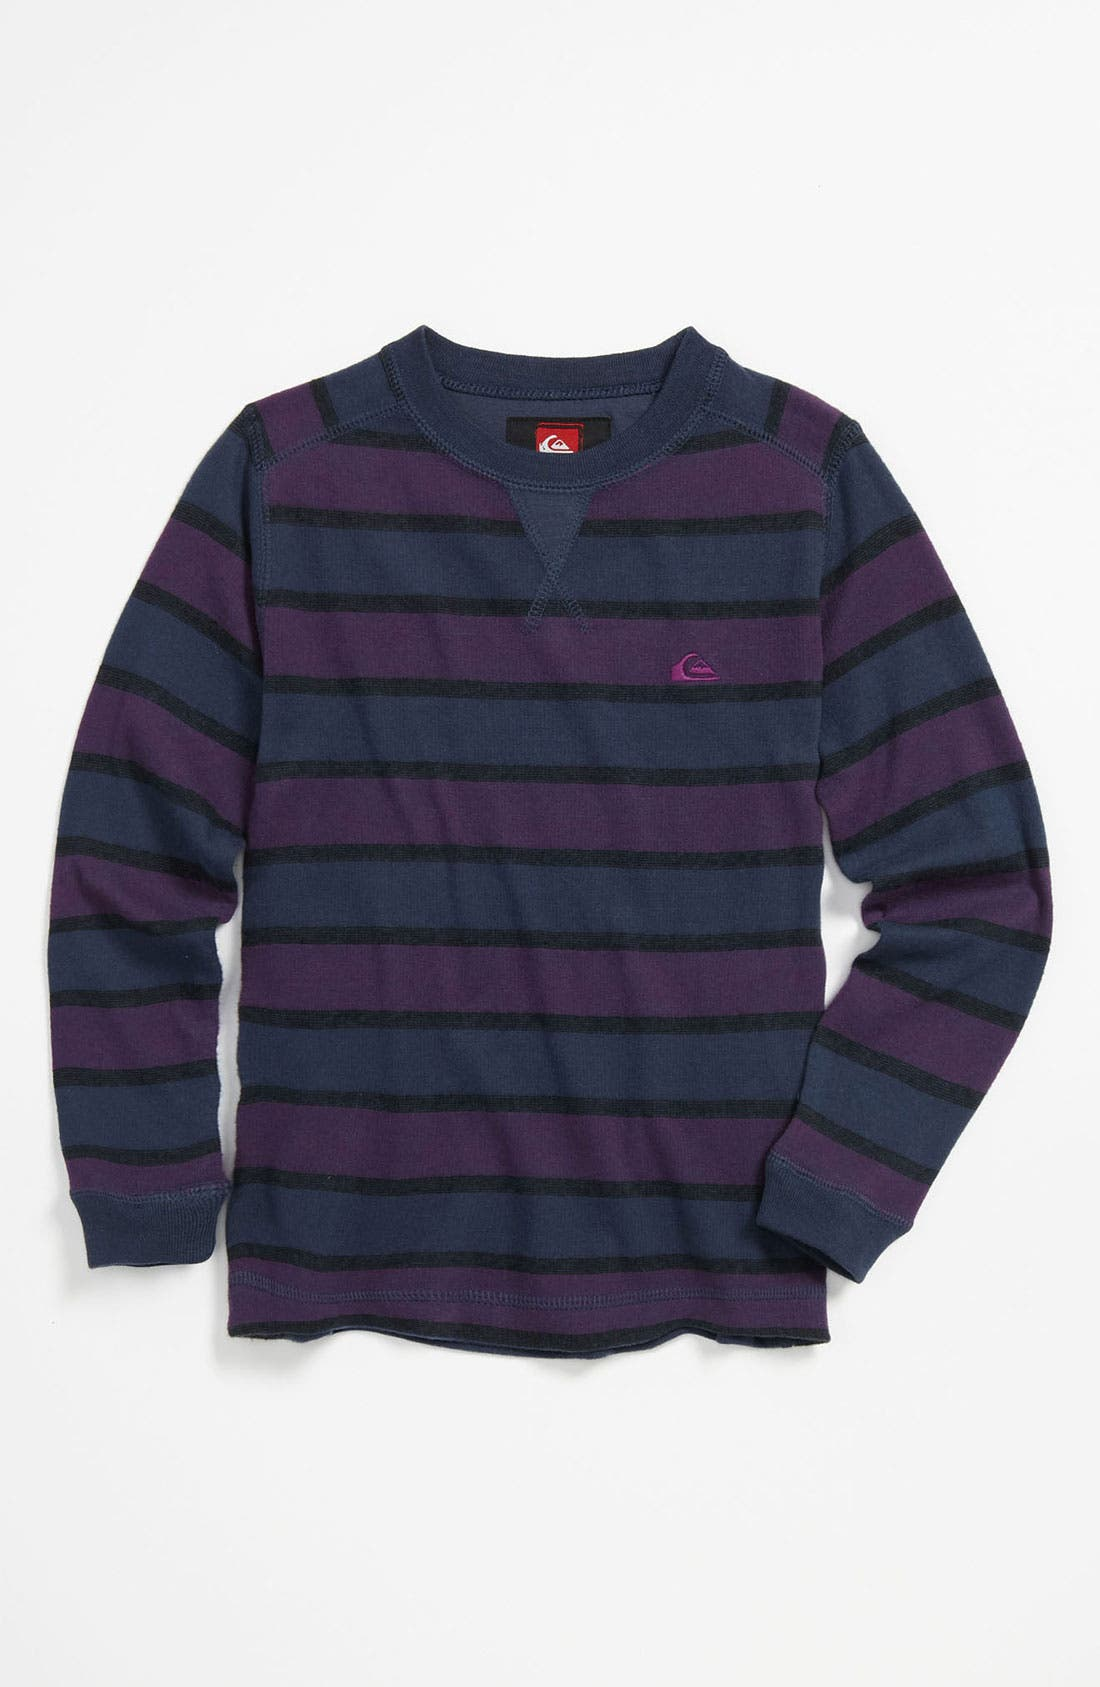 Main Image - Quiksilver 'Snitty' Shirt (Little Boys)